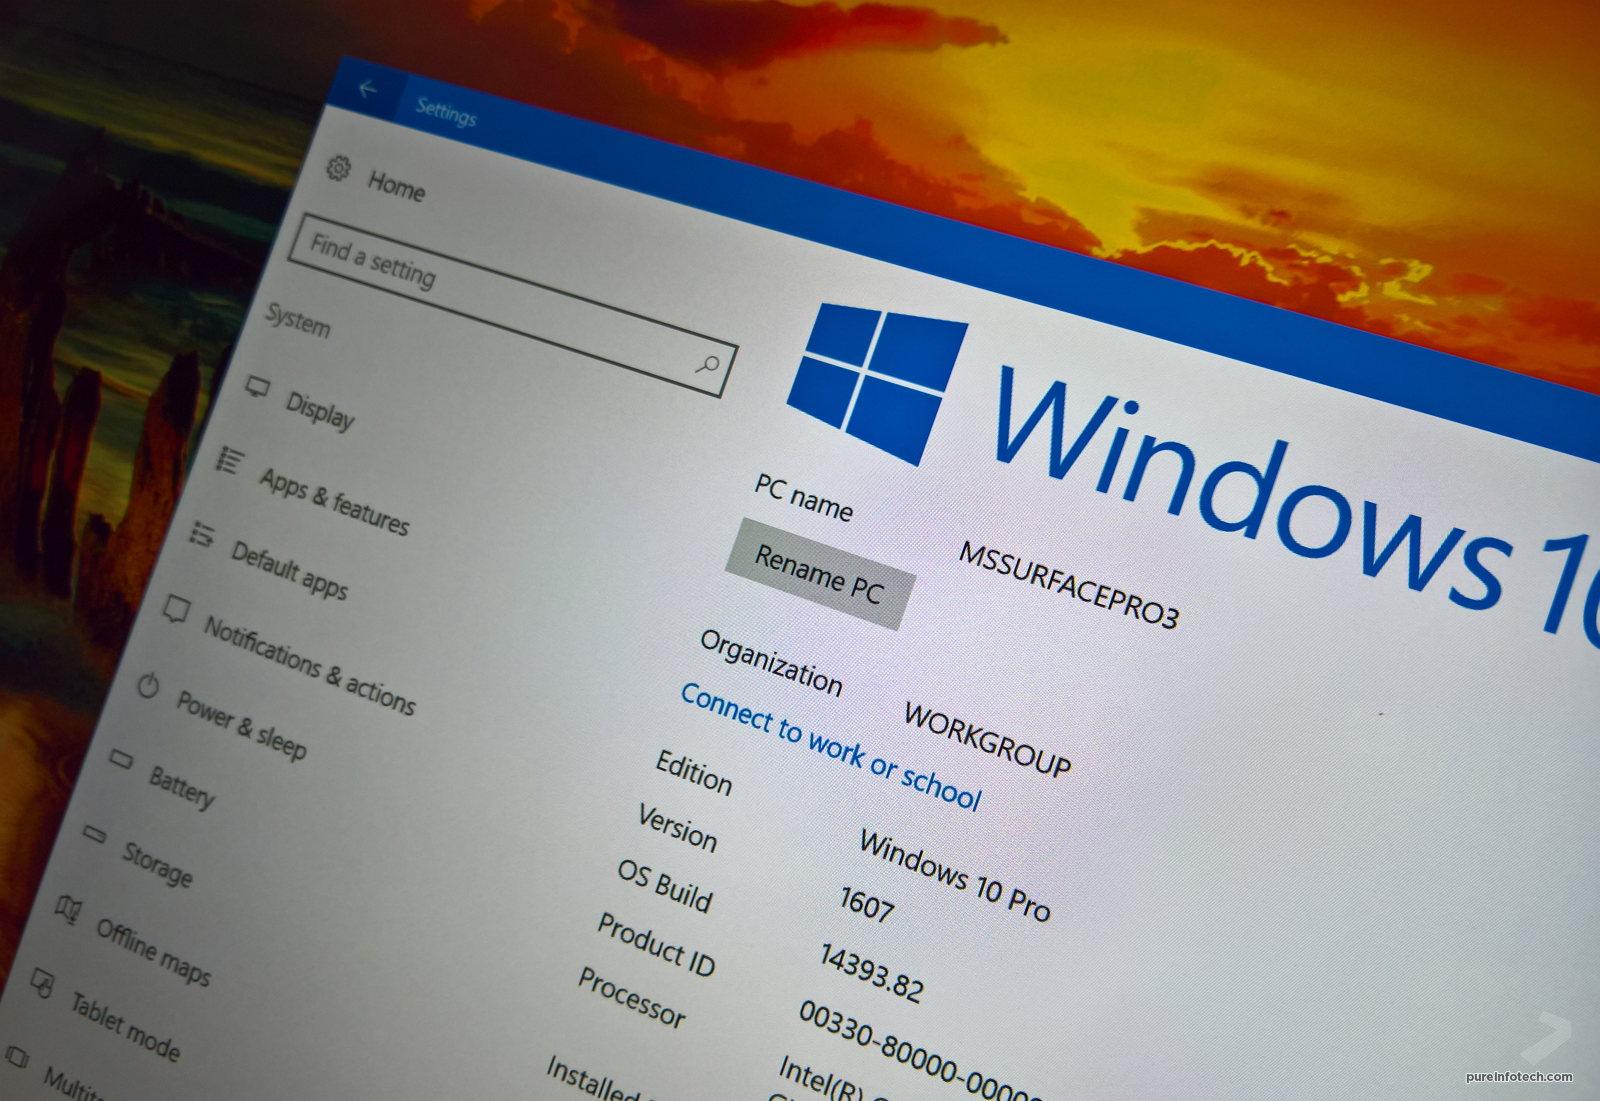 Windows 10 Rename PC